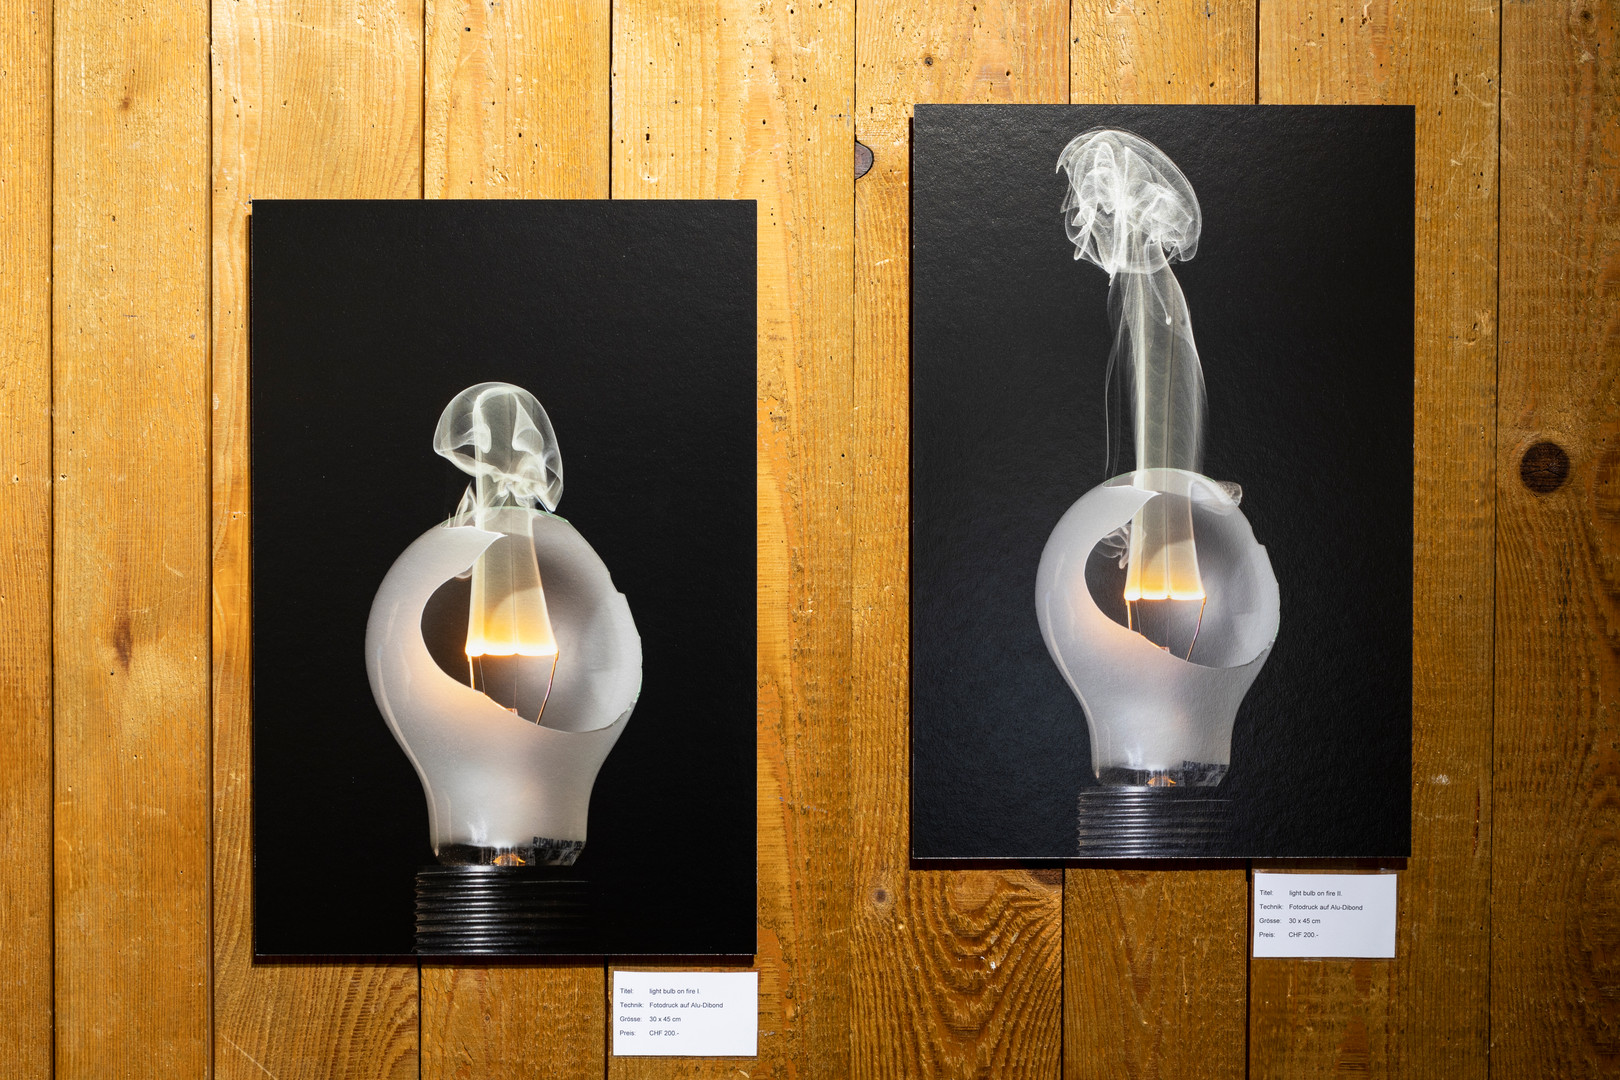 light bulb on fire I. und II.